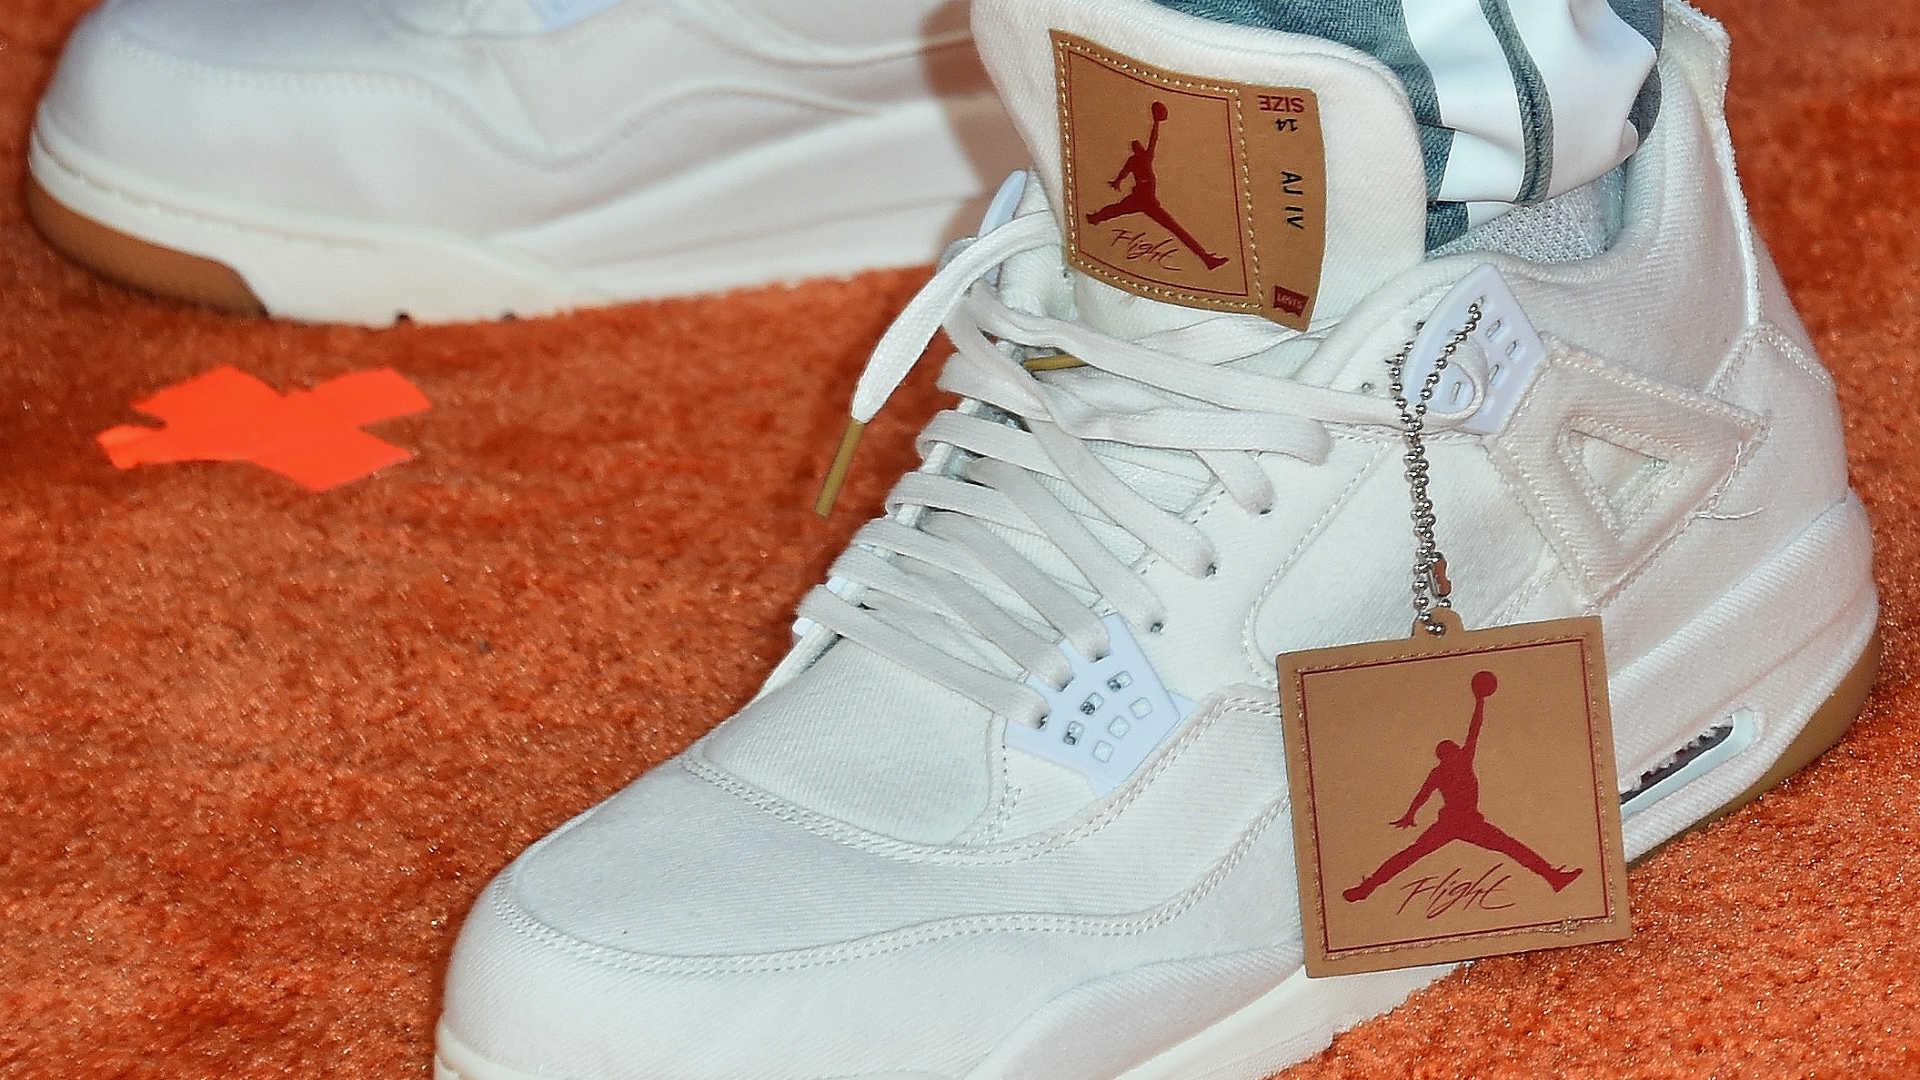 eadb18c00ff1 Feds bust  70M counterfeit Air Jordans ring